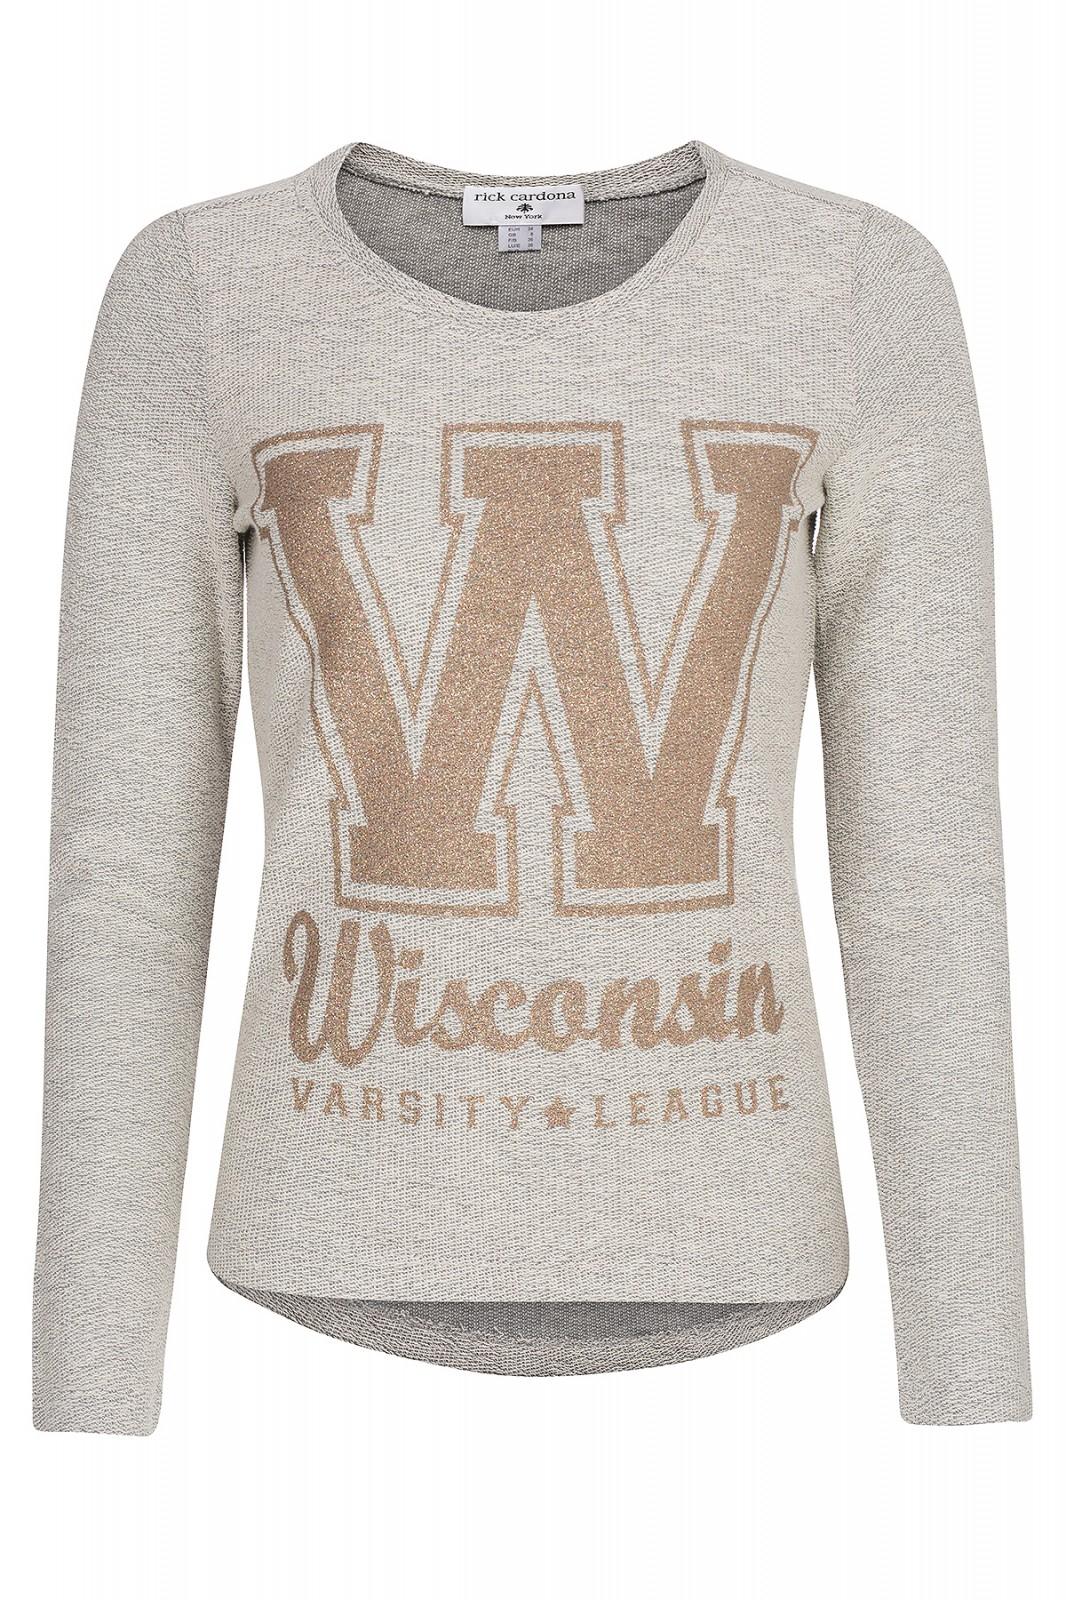 Rick Cardona Wisconsin Damen Pullover Grau für 7,99€ @outlet46